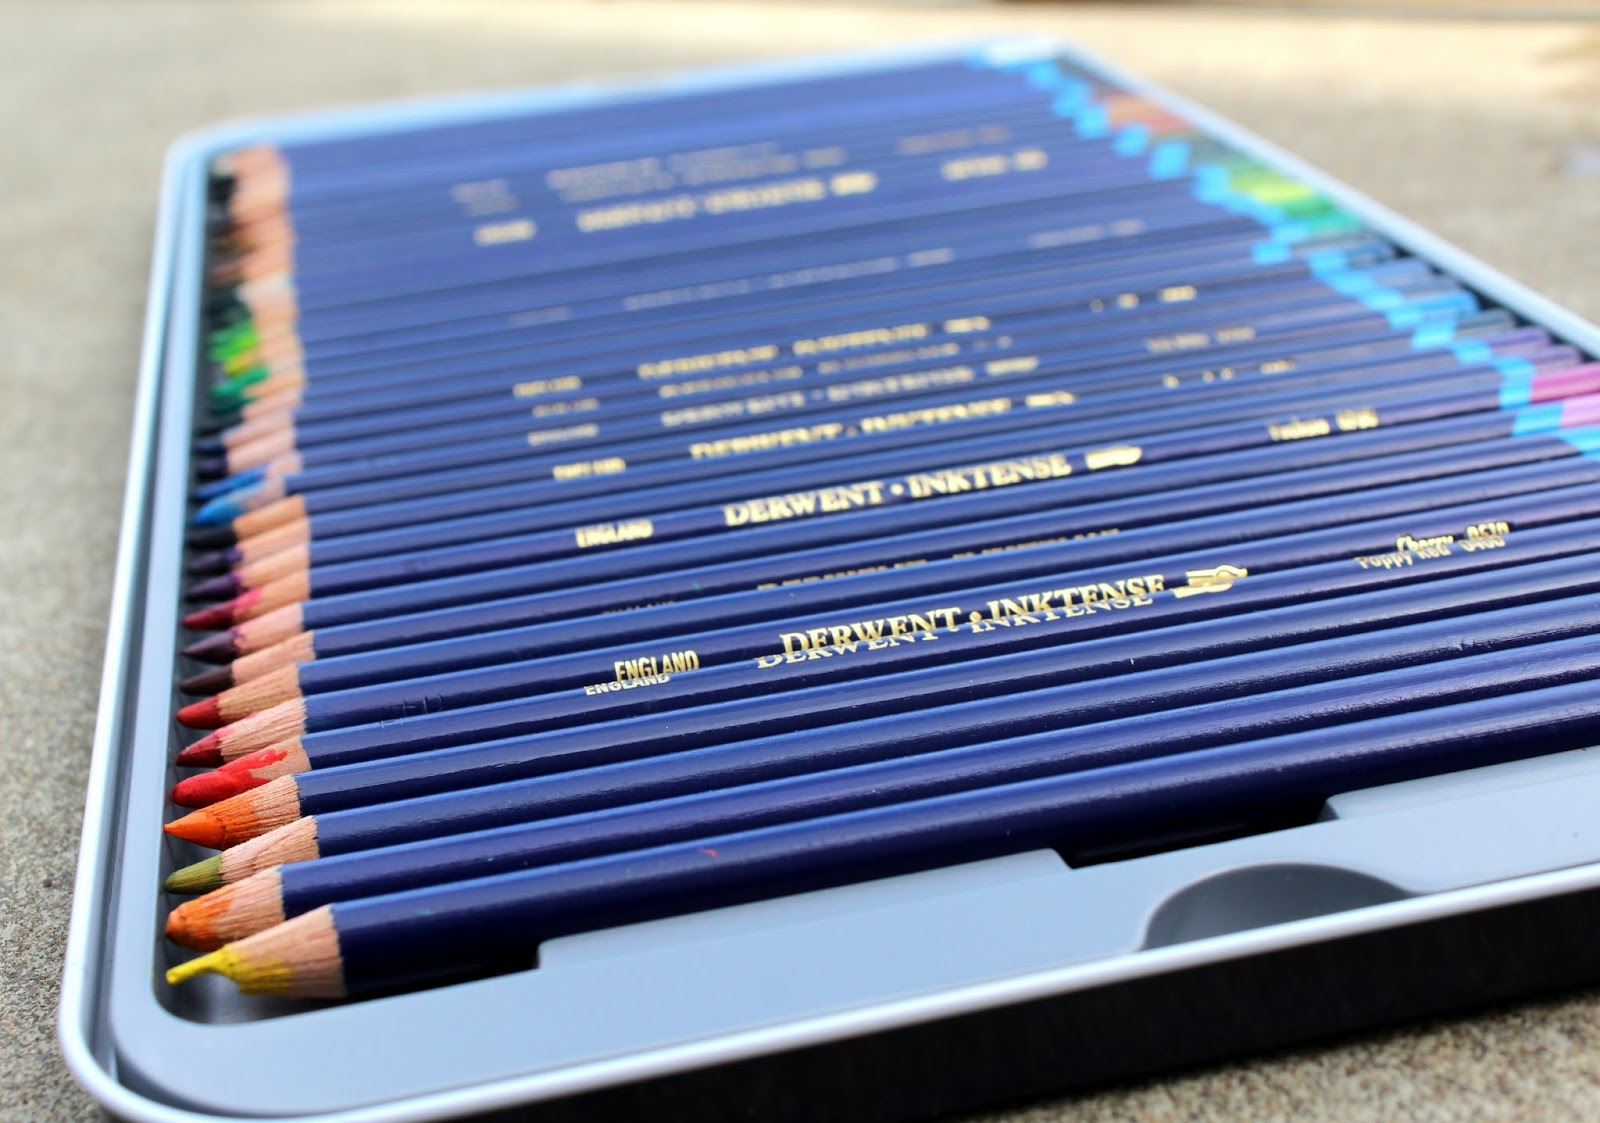 toolbox journaling bible checking stopping thanks